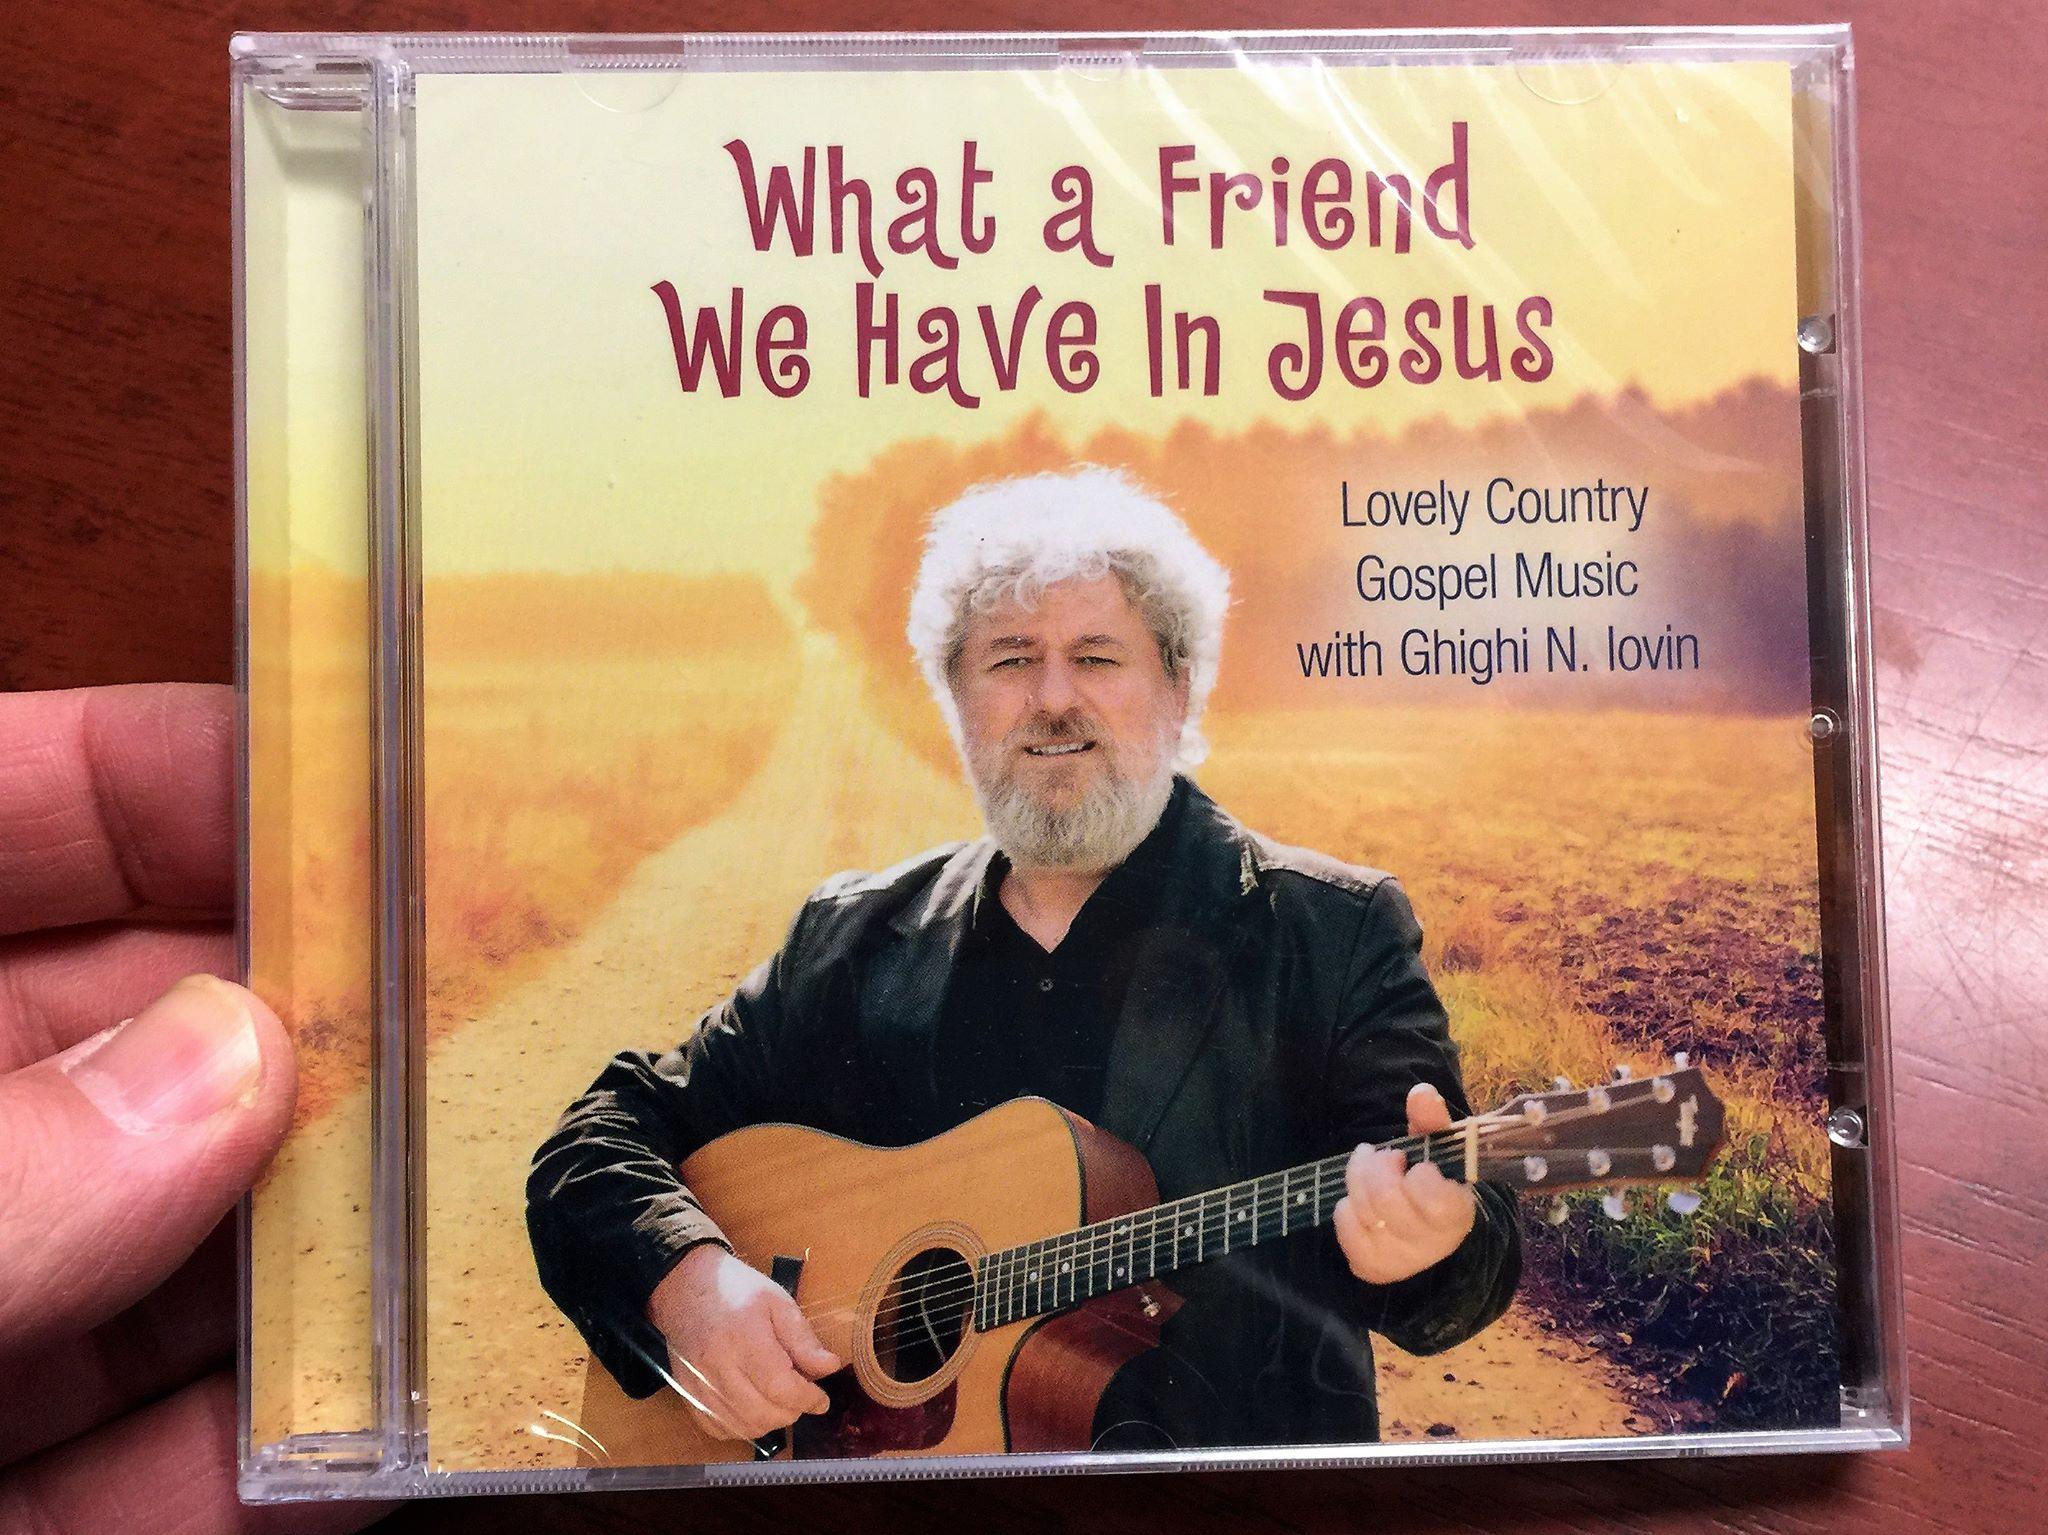 what-a-friend-we-have-in-jesus-ghighi-n.-lovin-cd-2017-lovely-country-gospel-music-1-.jpg